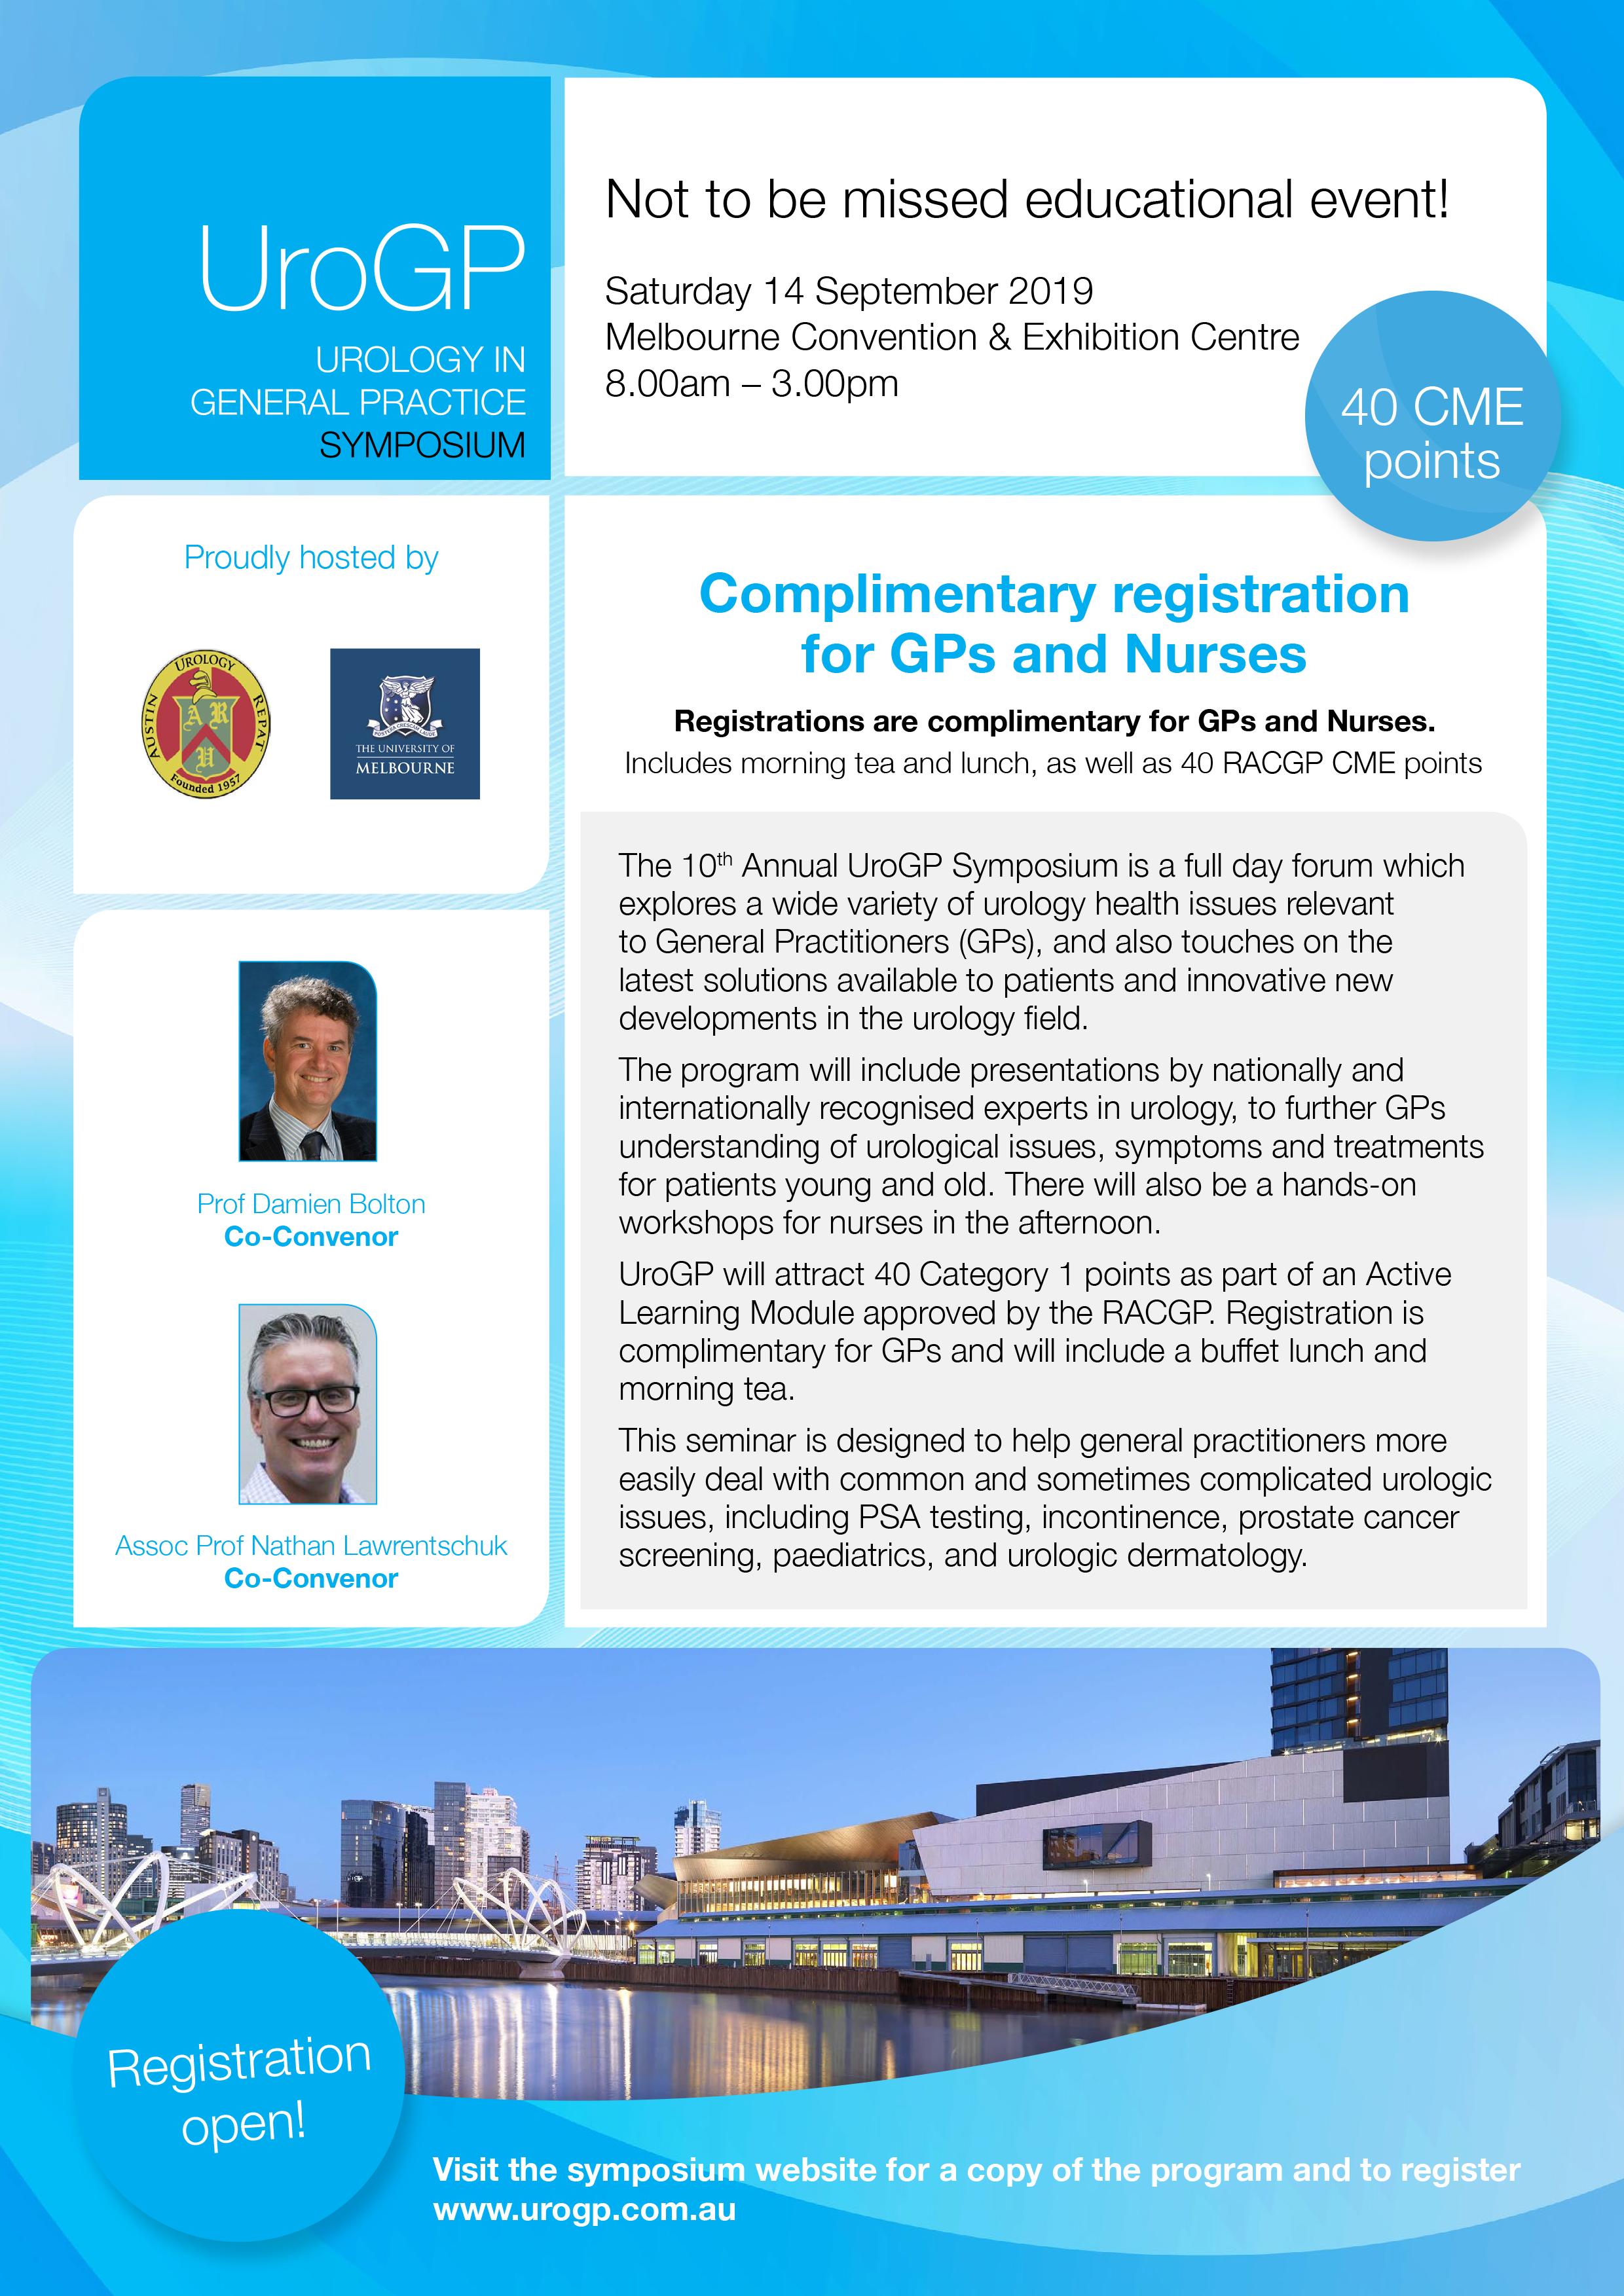 UroGP Symposium promotional flyer